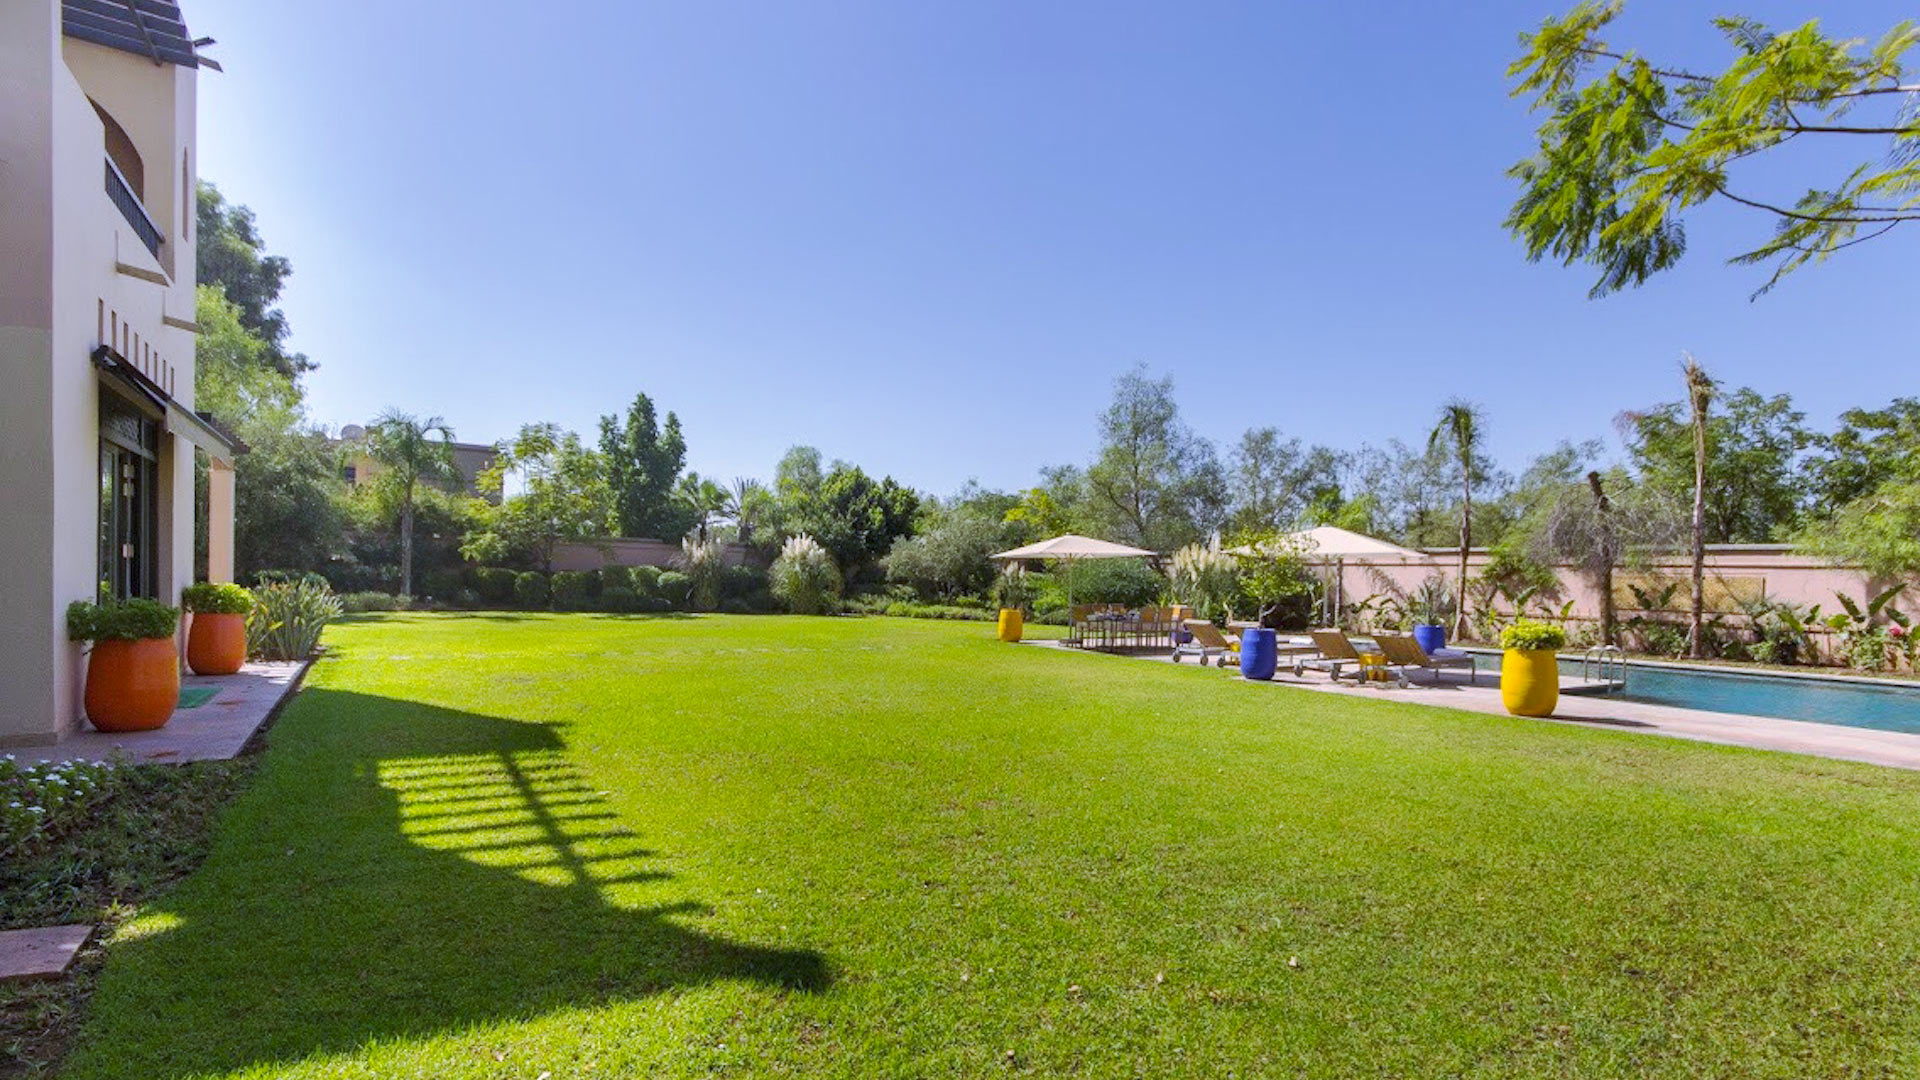 Villa Villa Four Seasons 1, Ferienvilla mieten Marrakesch